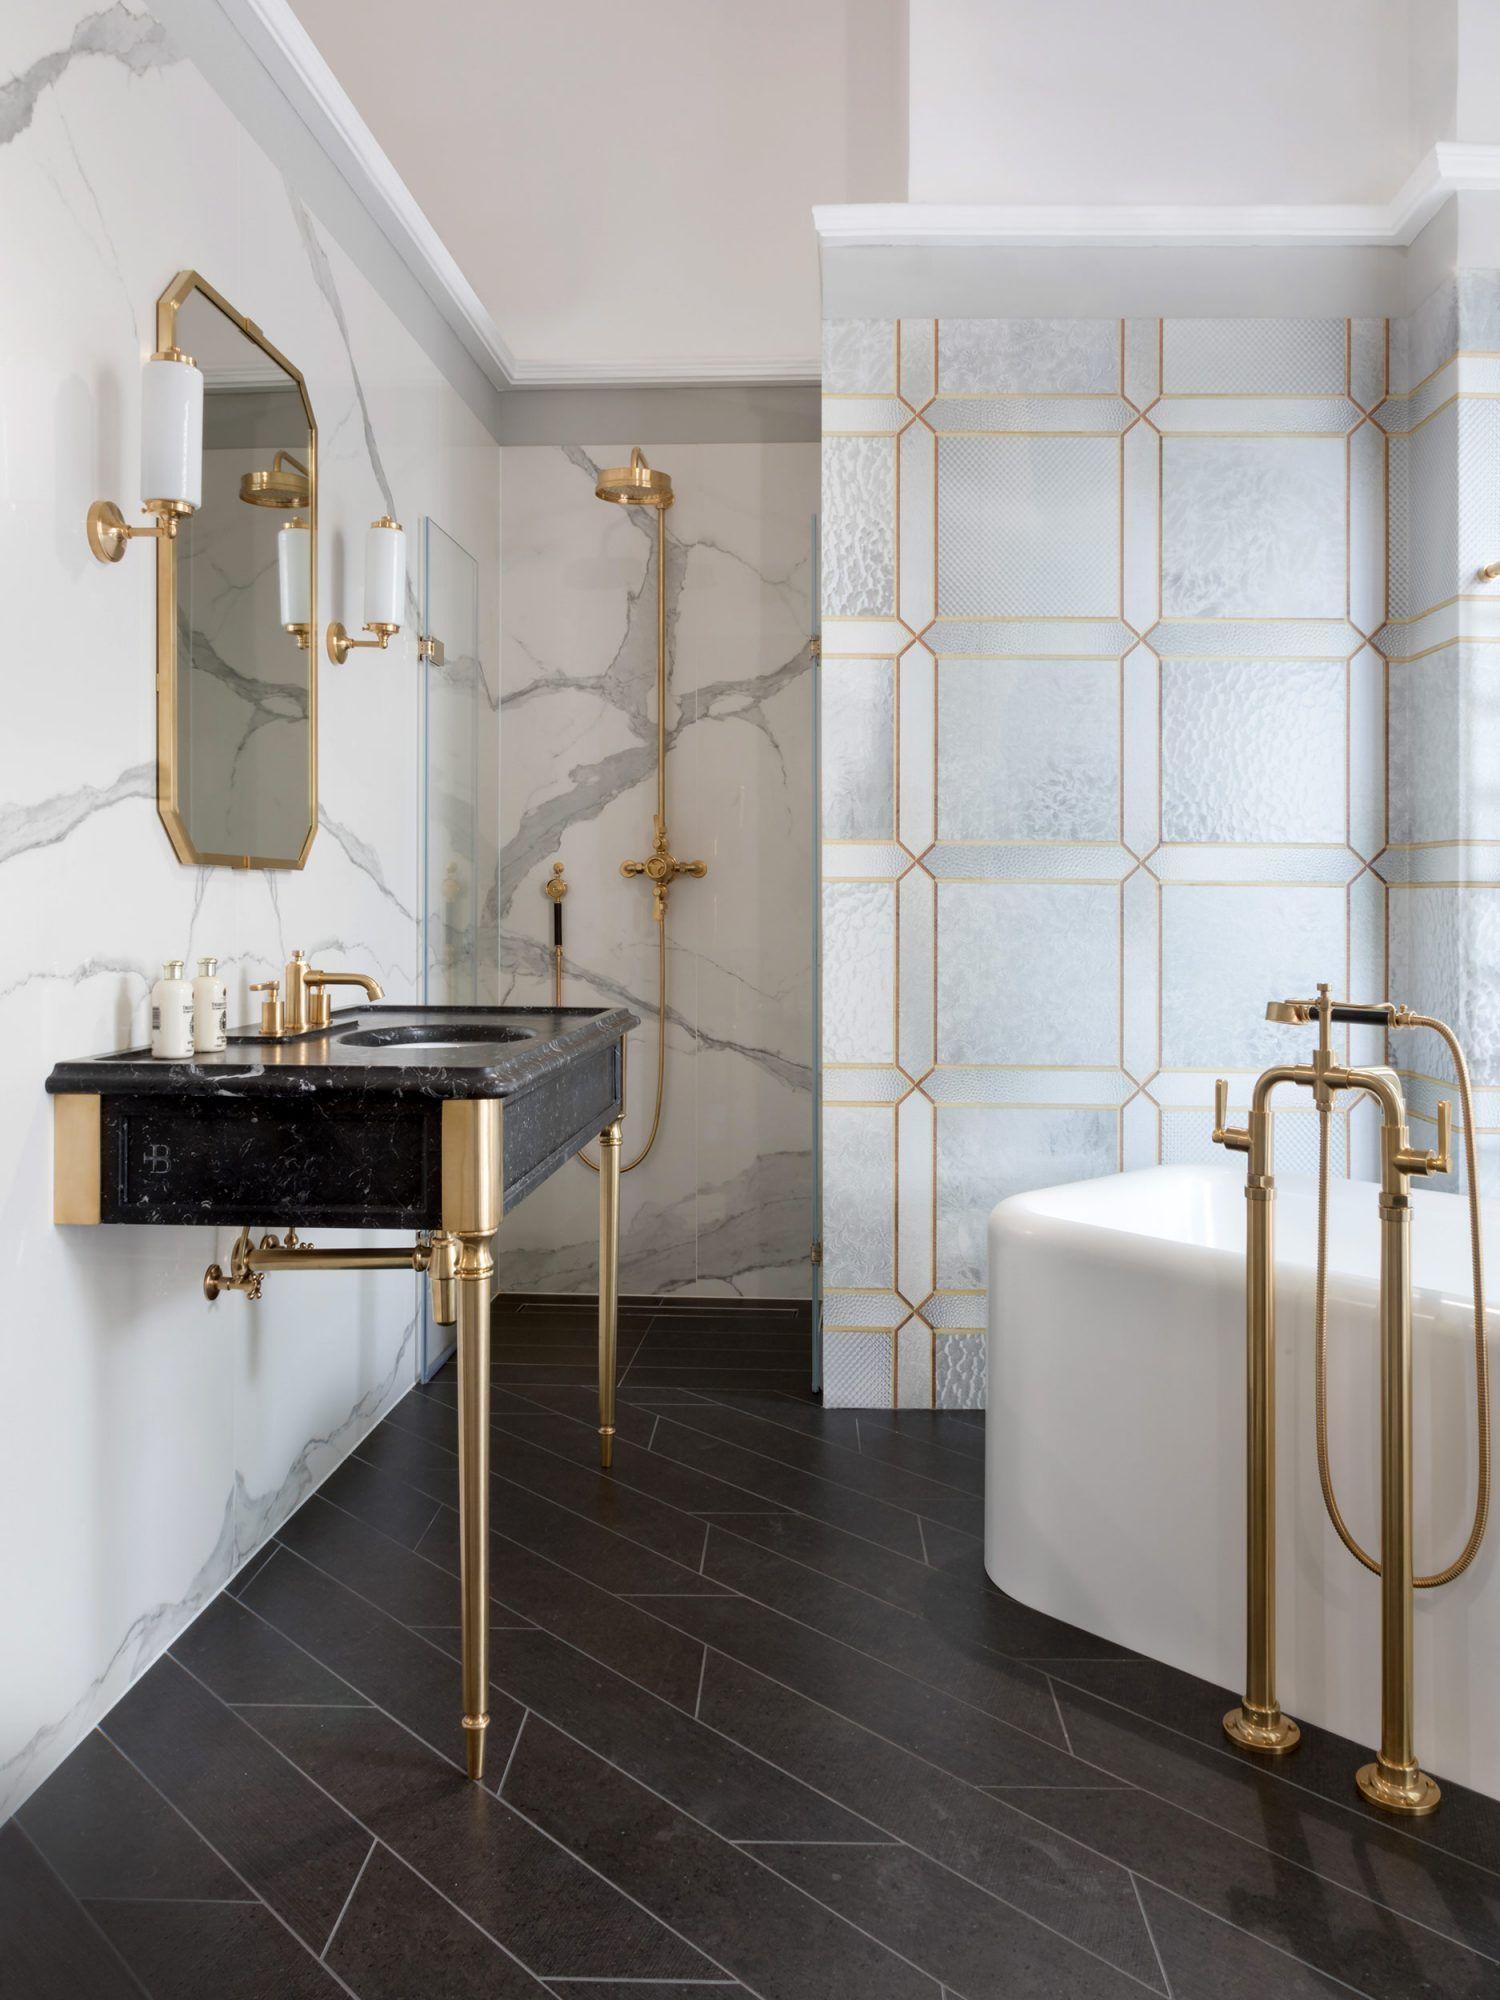 Accents Of Gold Bathroom Inspiration Bathroom Interior Chic Bathrooms Bathroom Inspiration